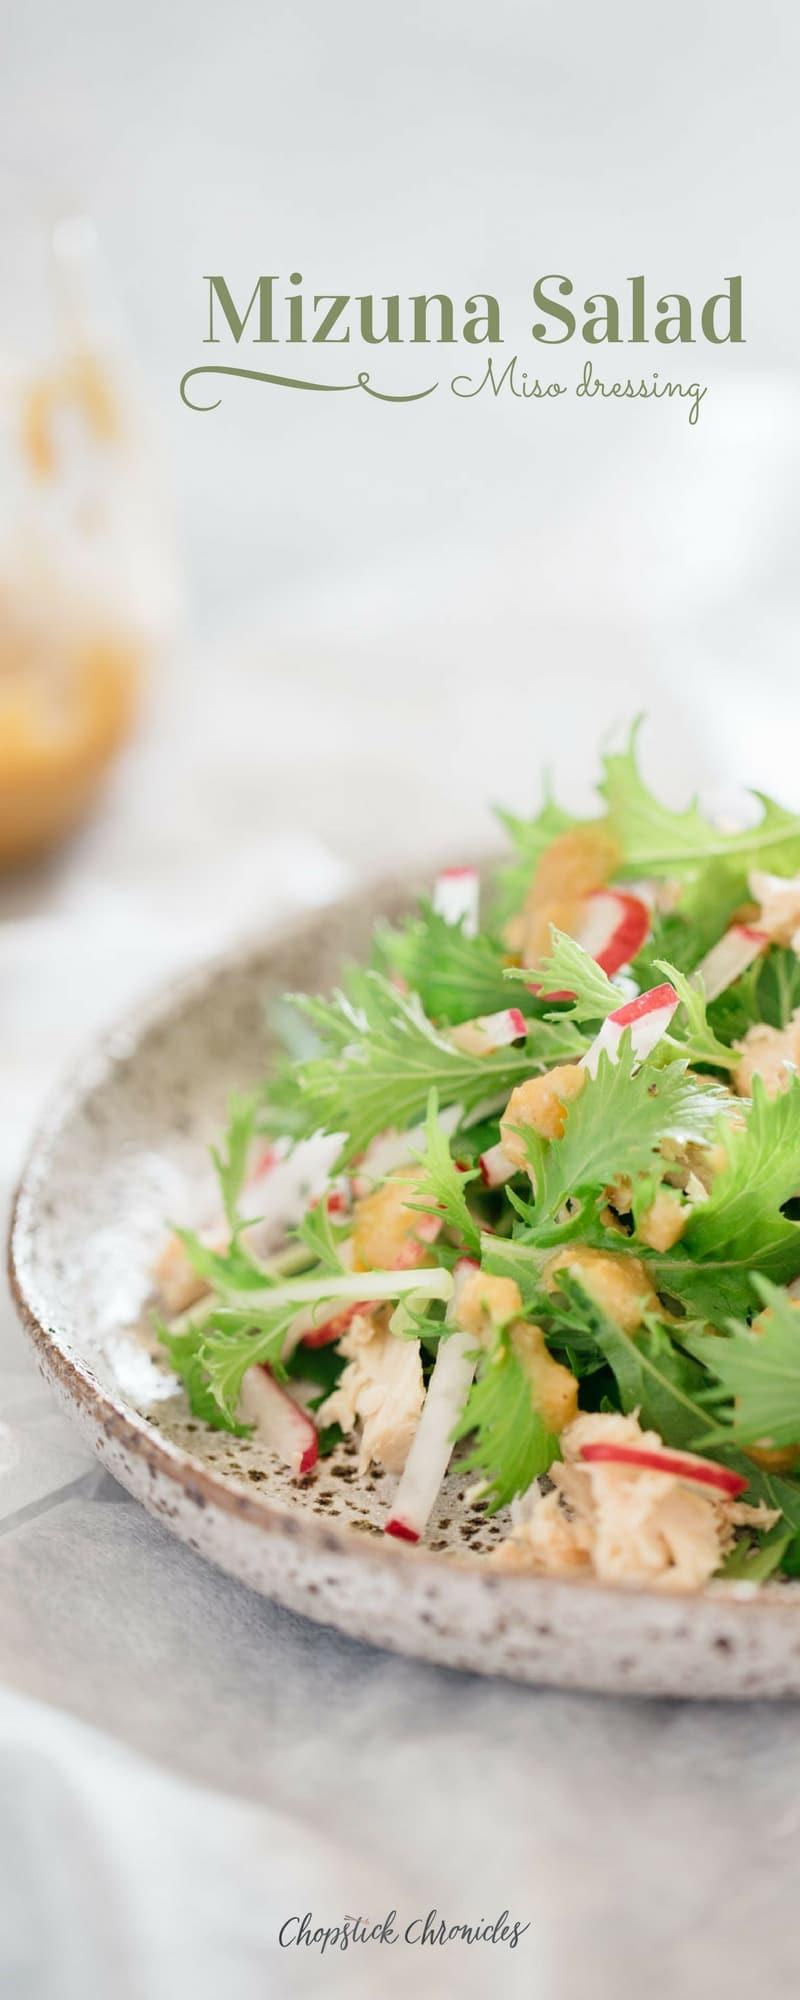 Mizuna Salad miso dressing